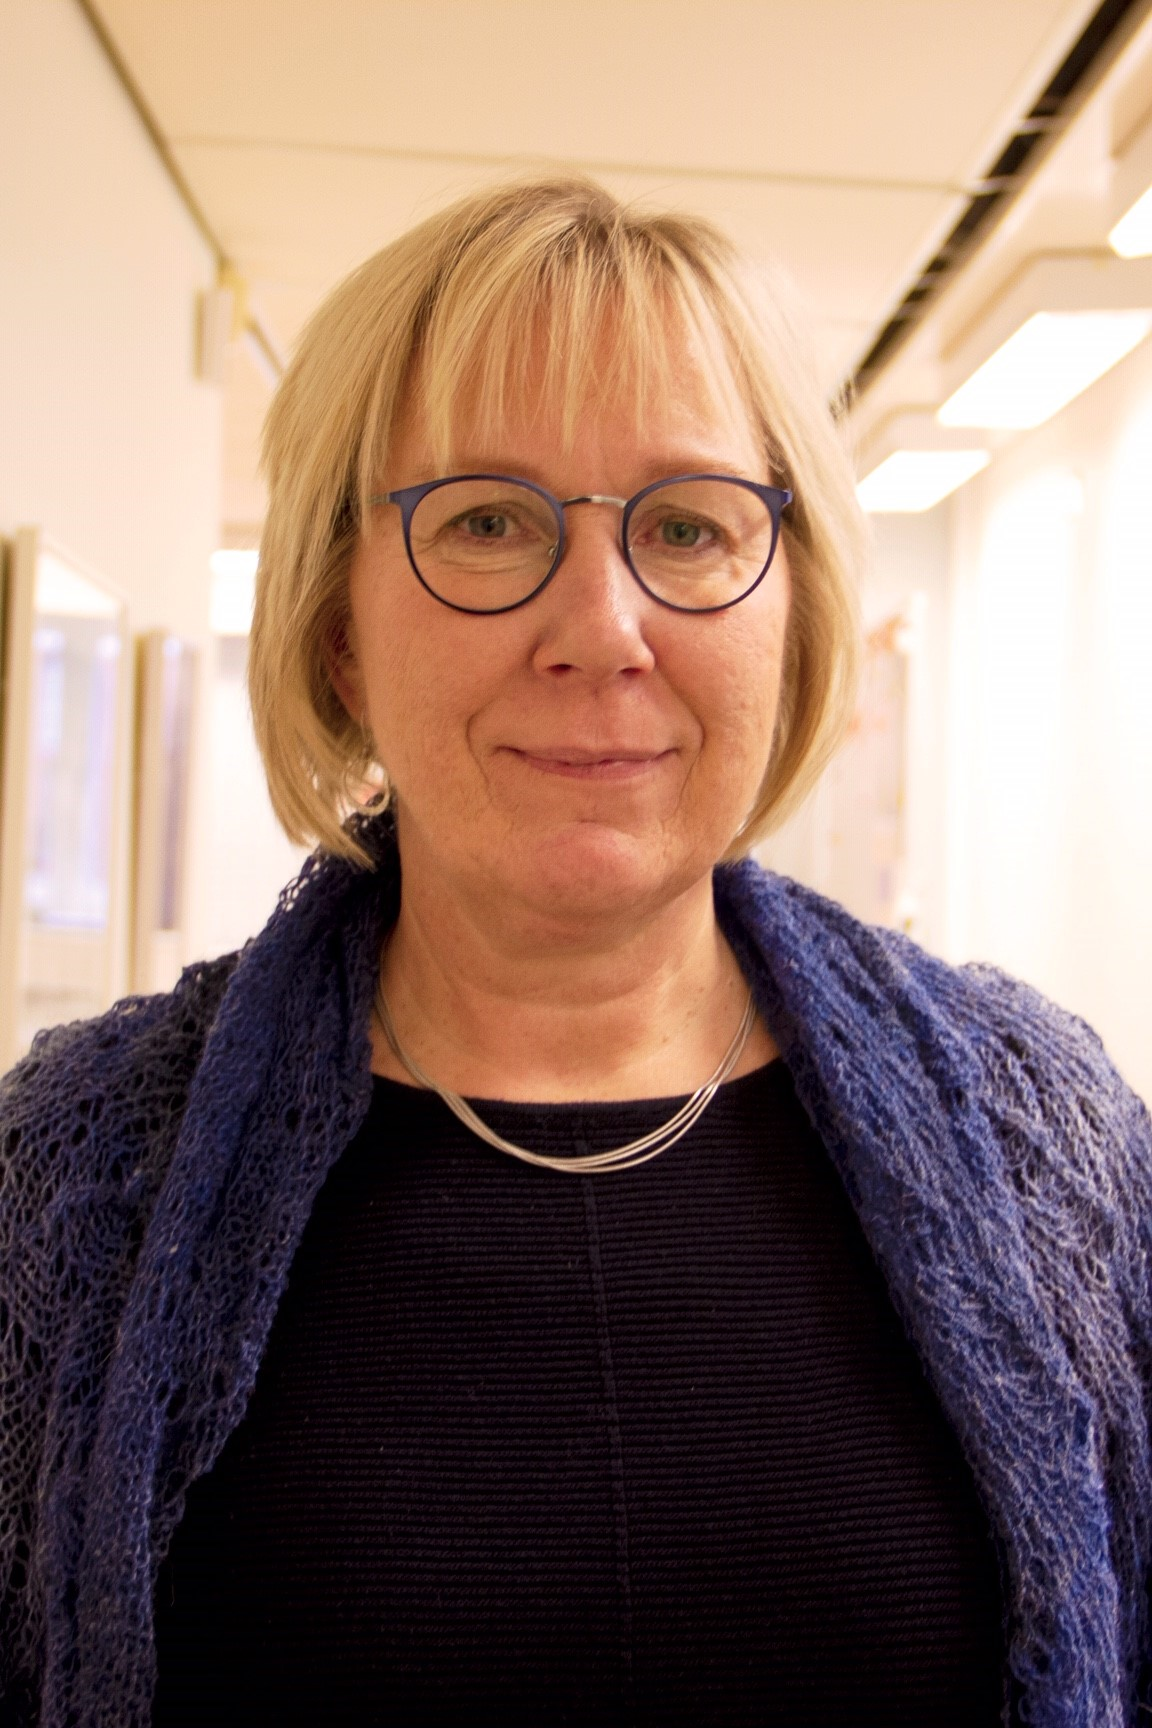 Iris Pettersson